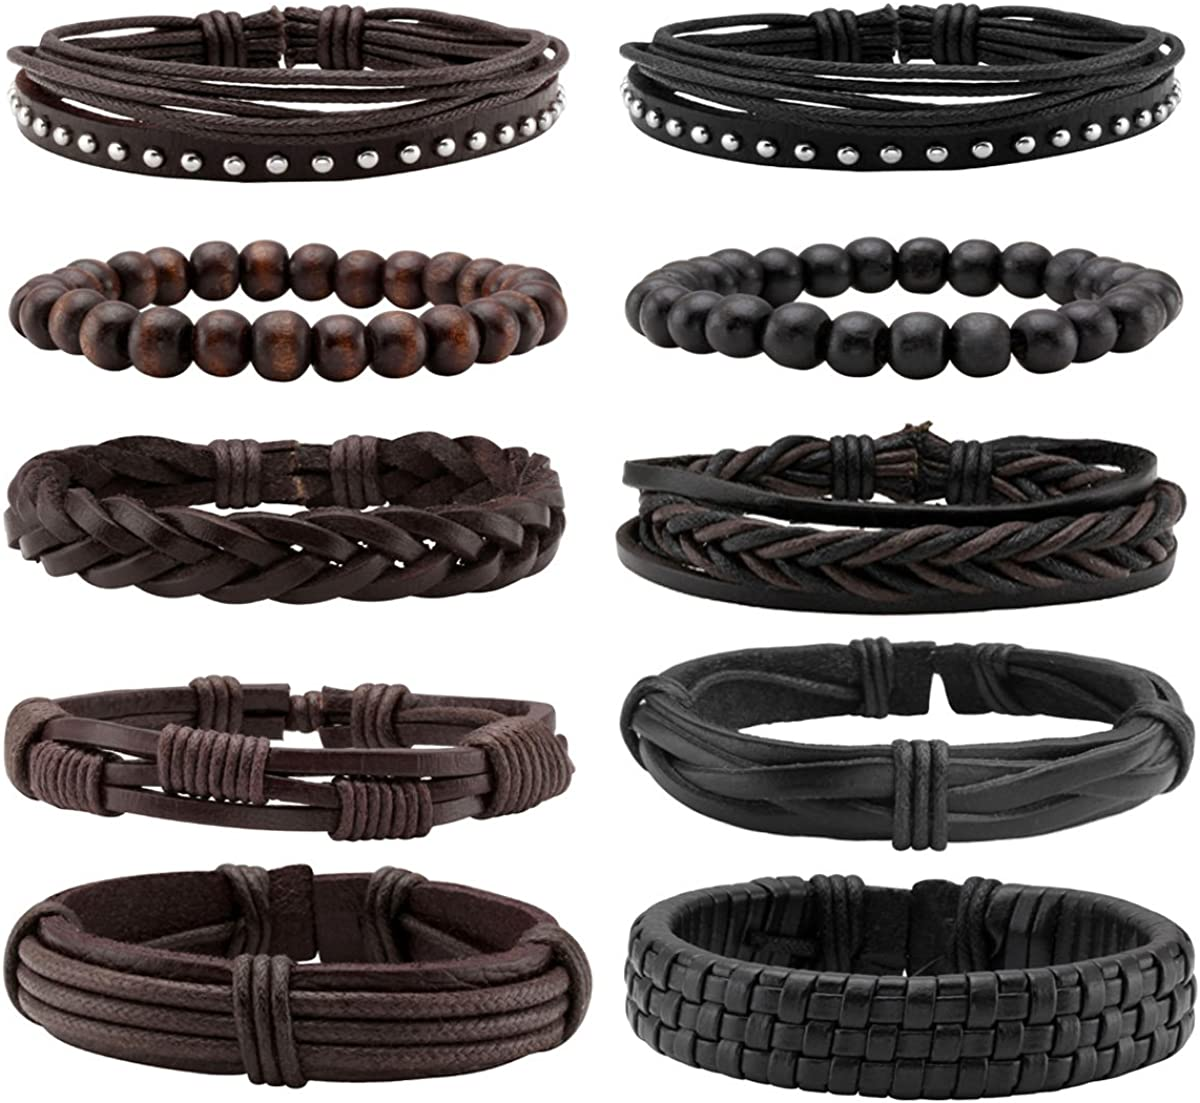 Eigso 10Pcs Braided Leather Bracelets Set for Men Women Hemp Cords Wooden Beads Adjustable Wrap Bracelets